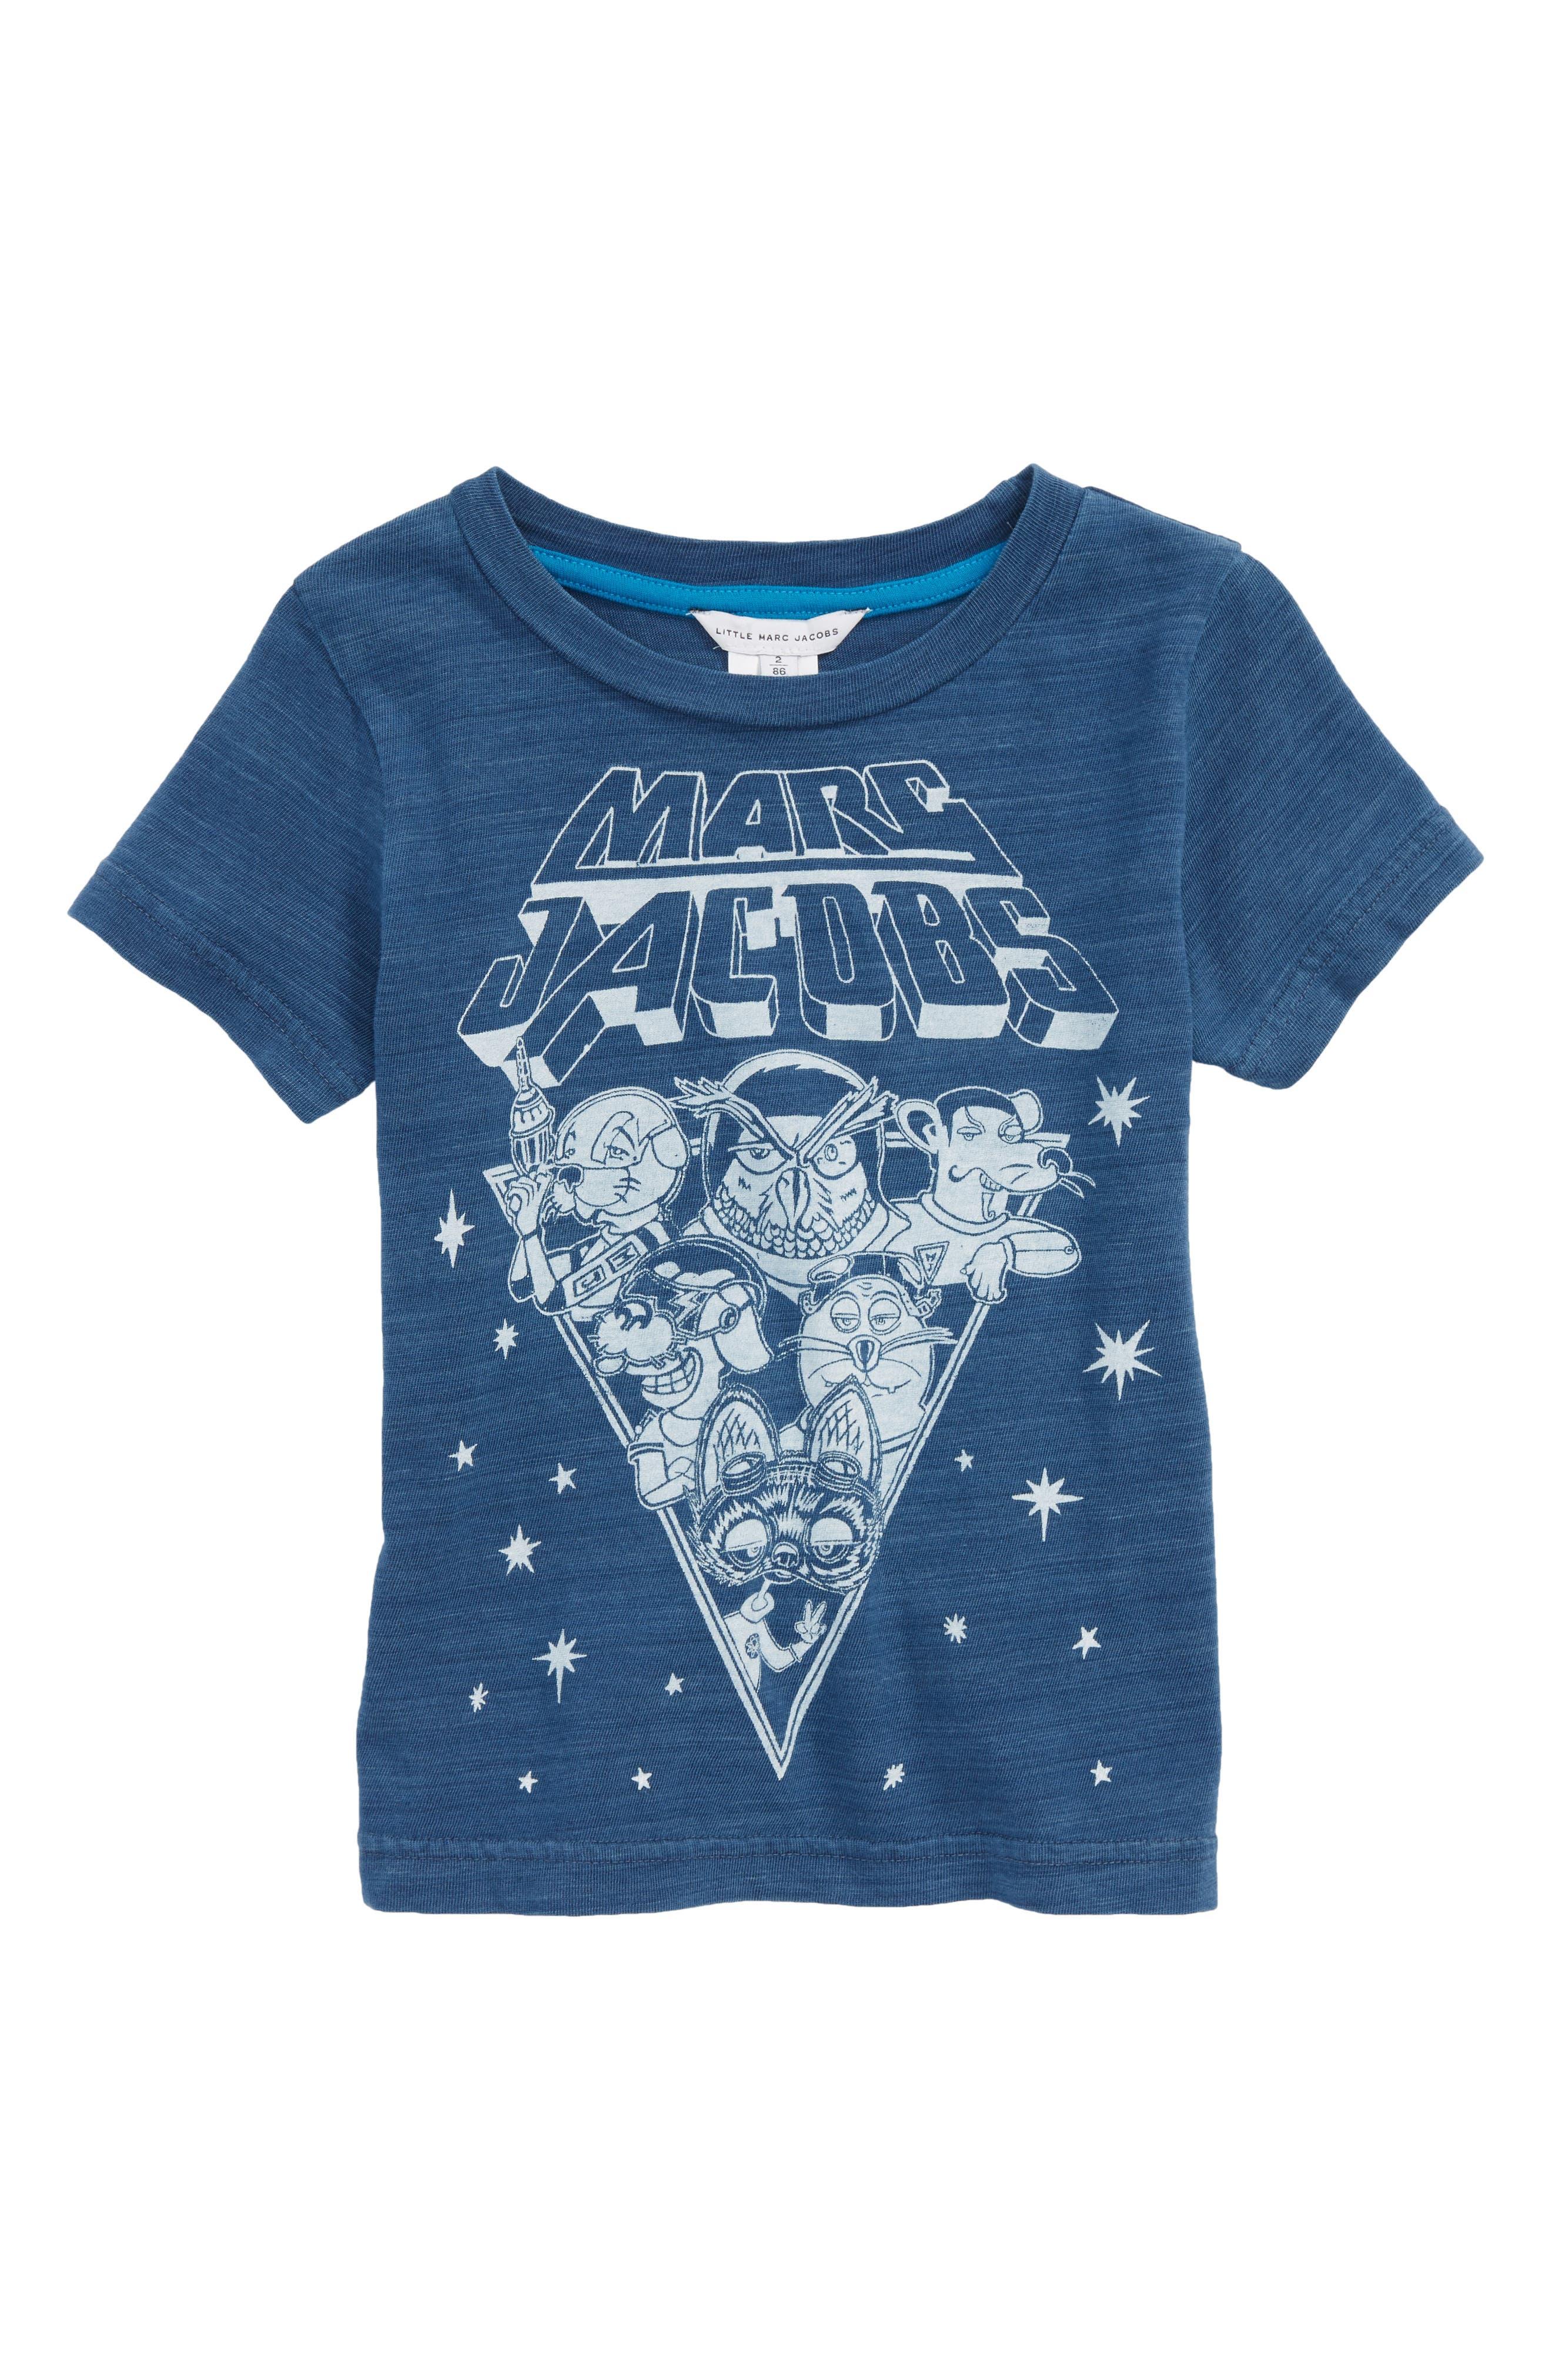 Space T-Shirt,                             Main thumbnail 1, color,                             Indigo/ Lavendar